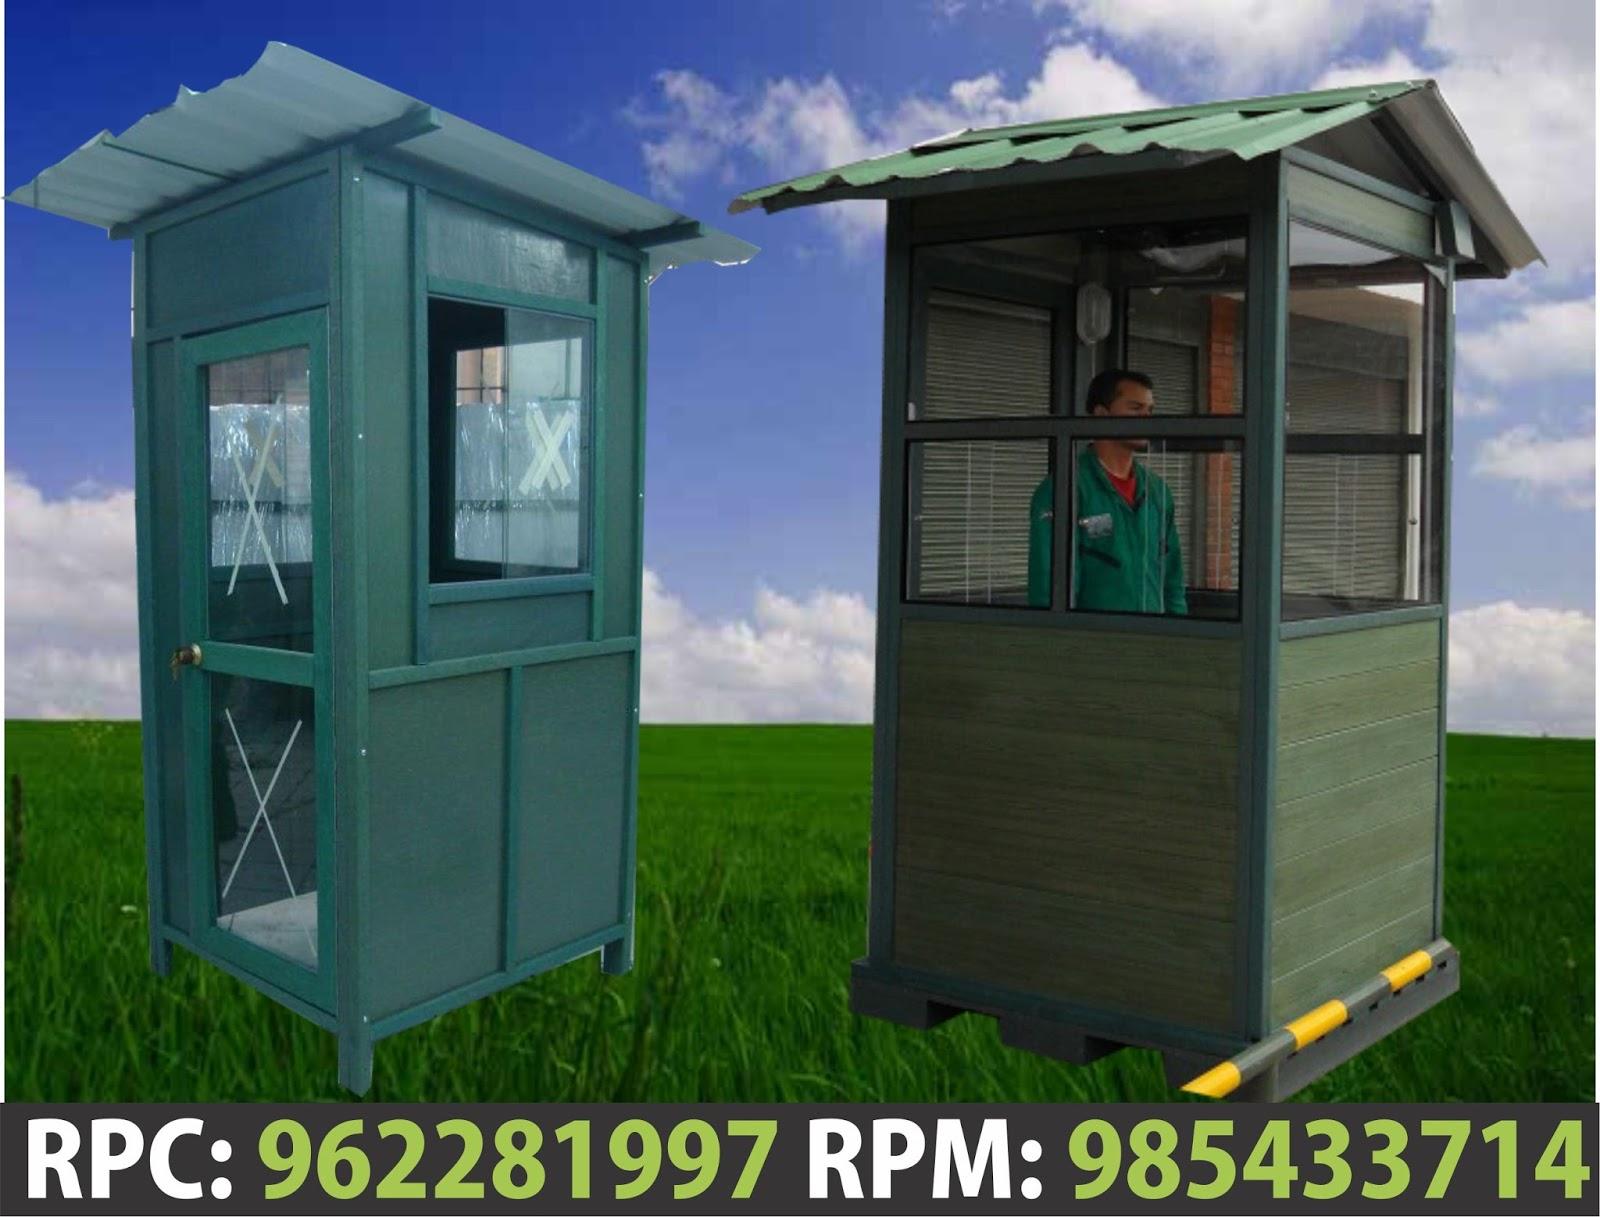 Casetas de seguridad casetas de vigilancia modelos dise os for Casetas para guardar cosas